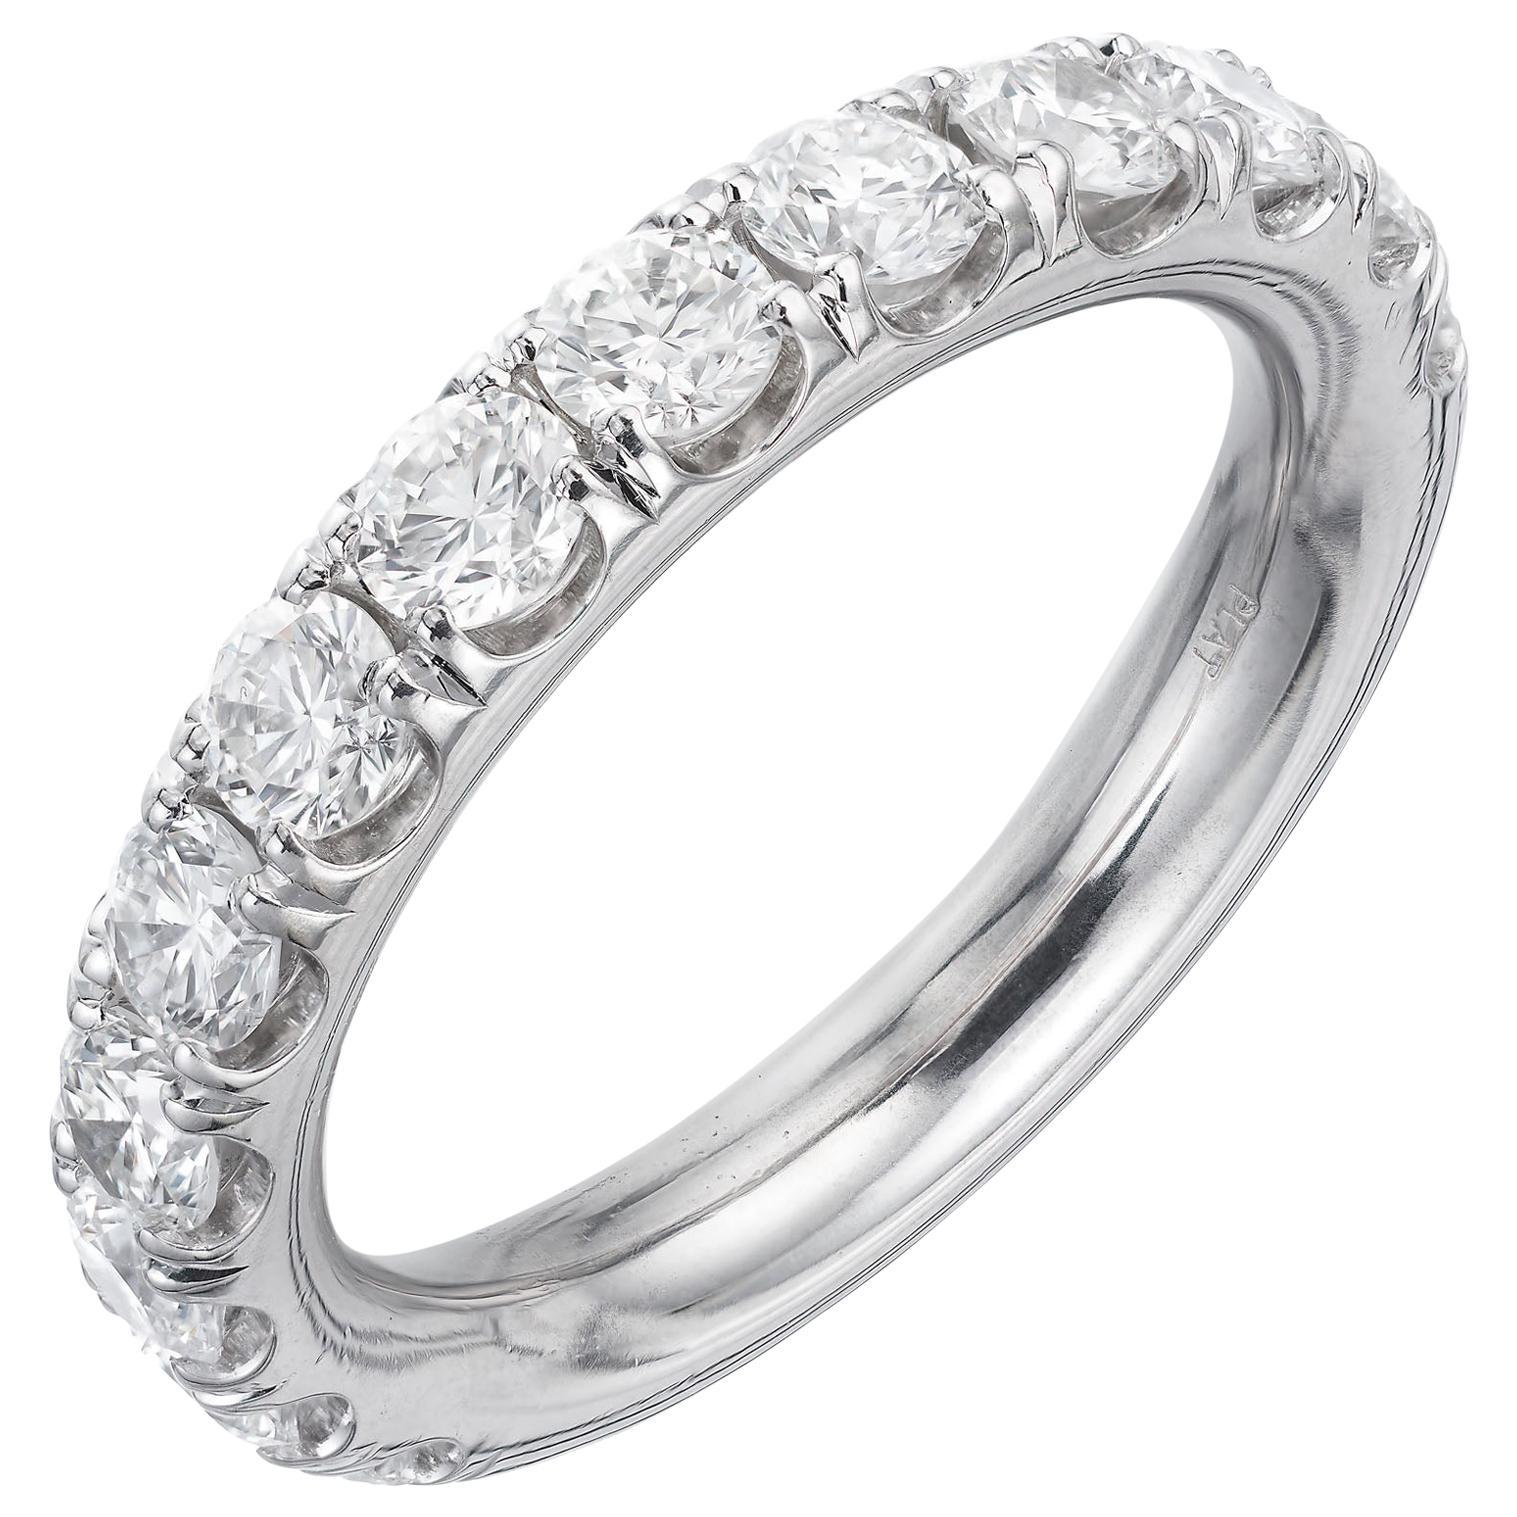 Peter Suchy 1.50 Carat Round Diamond Wedding Band Ring